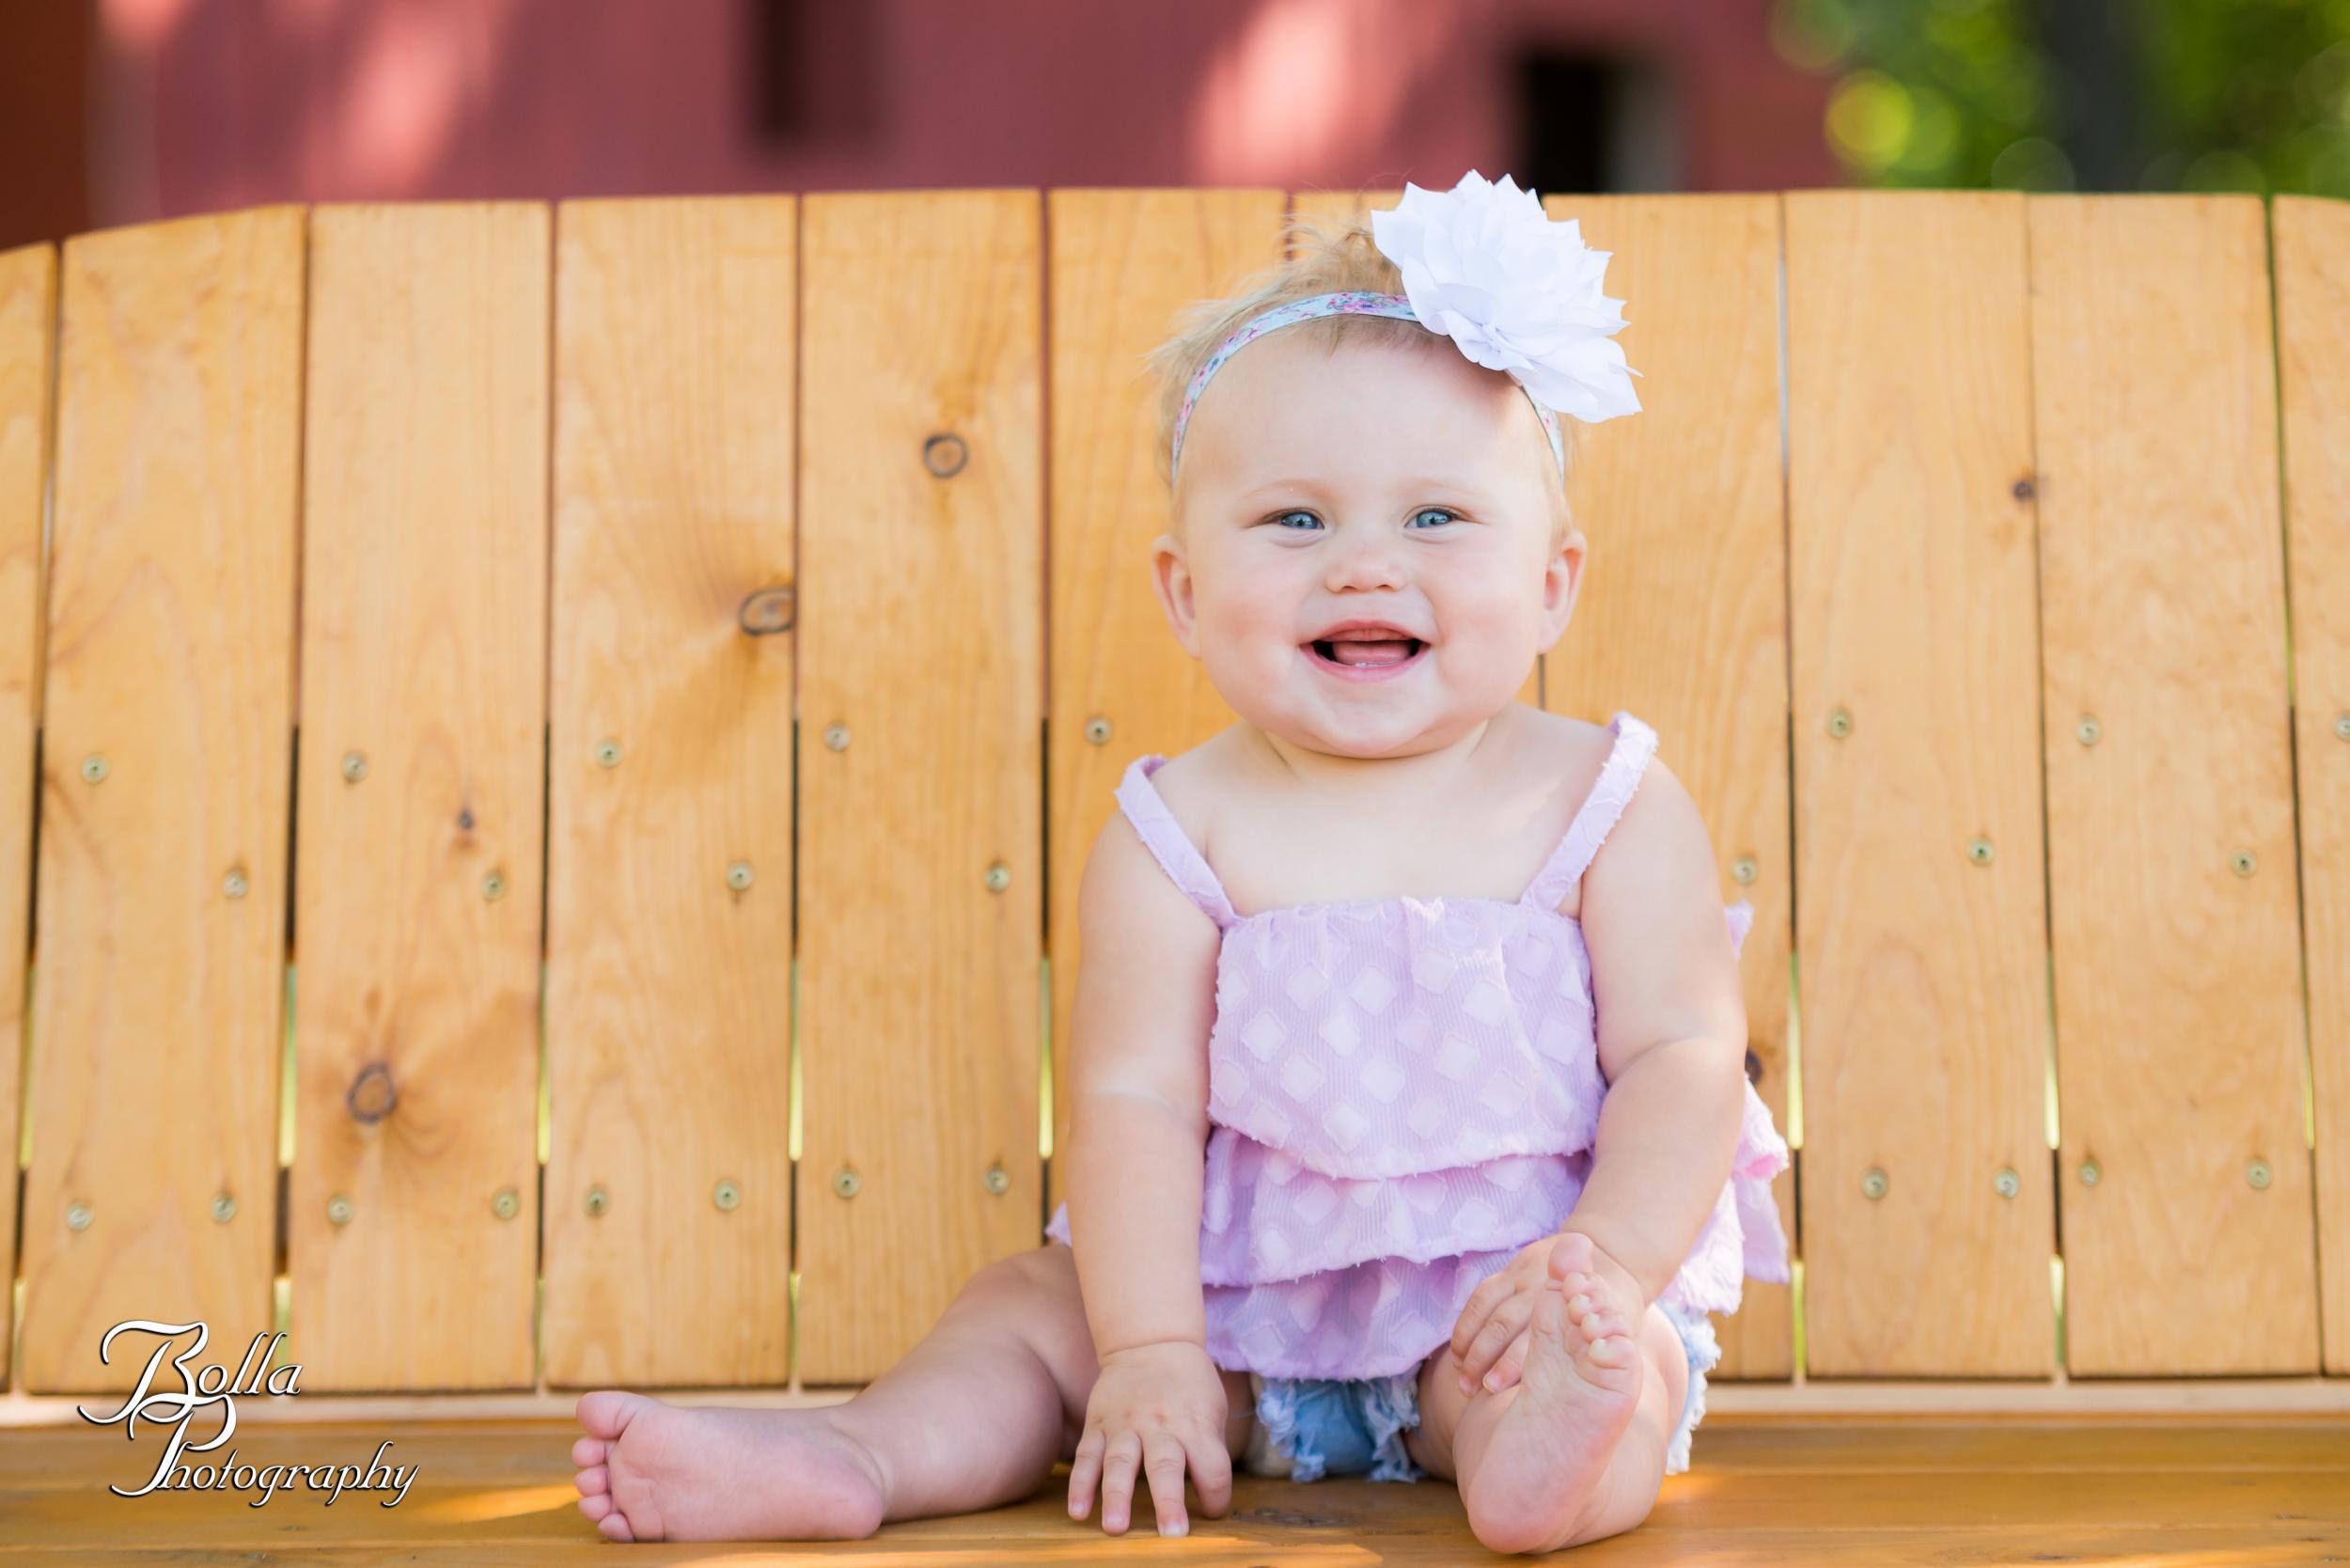 20170805_Bolla photography edwardsville wedding newborn photographer st louis weddings babies-0007.jpg